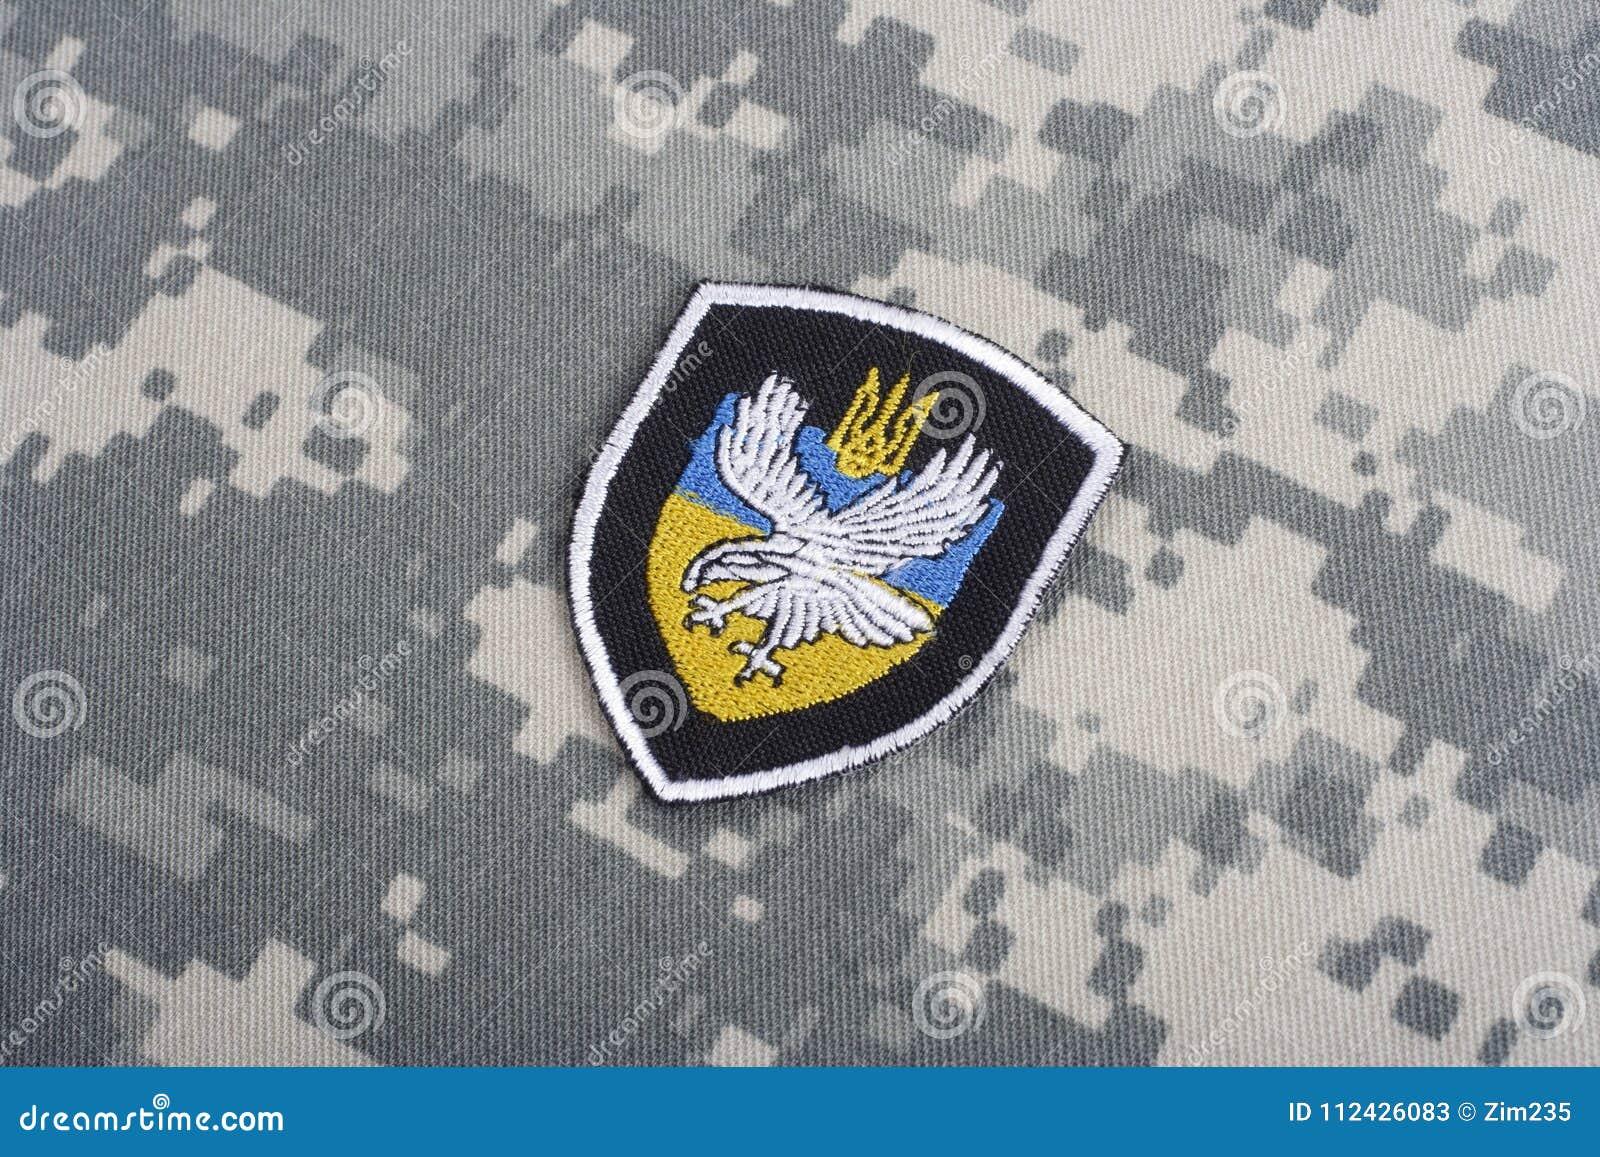 KYIV, UKRAINE - July, 16, 2015. Ministry of Internal Affairs Ukraine Titan uniform badge